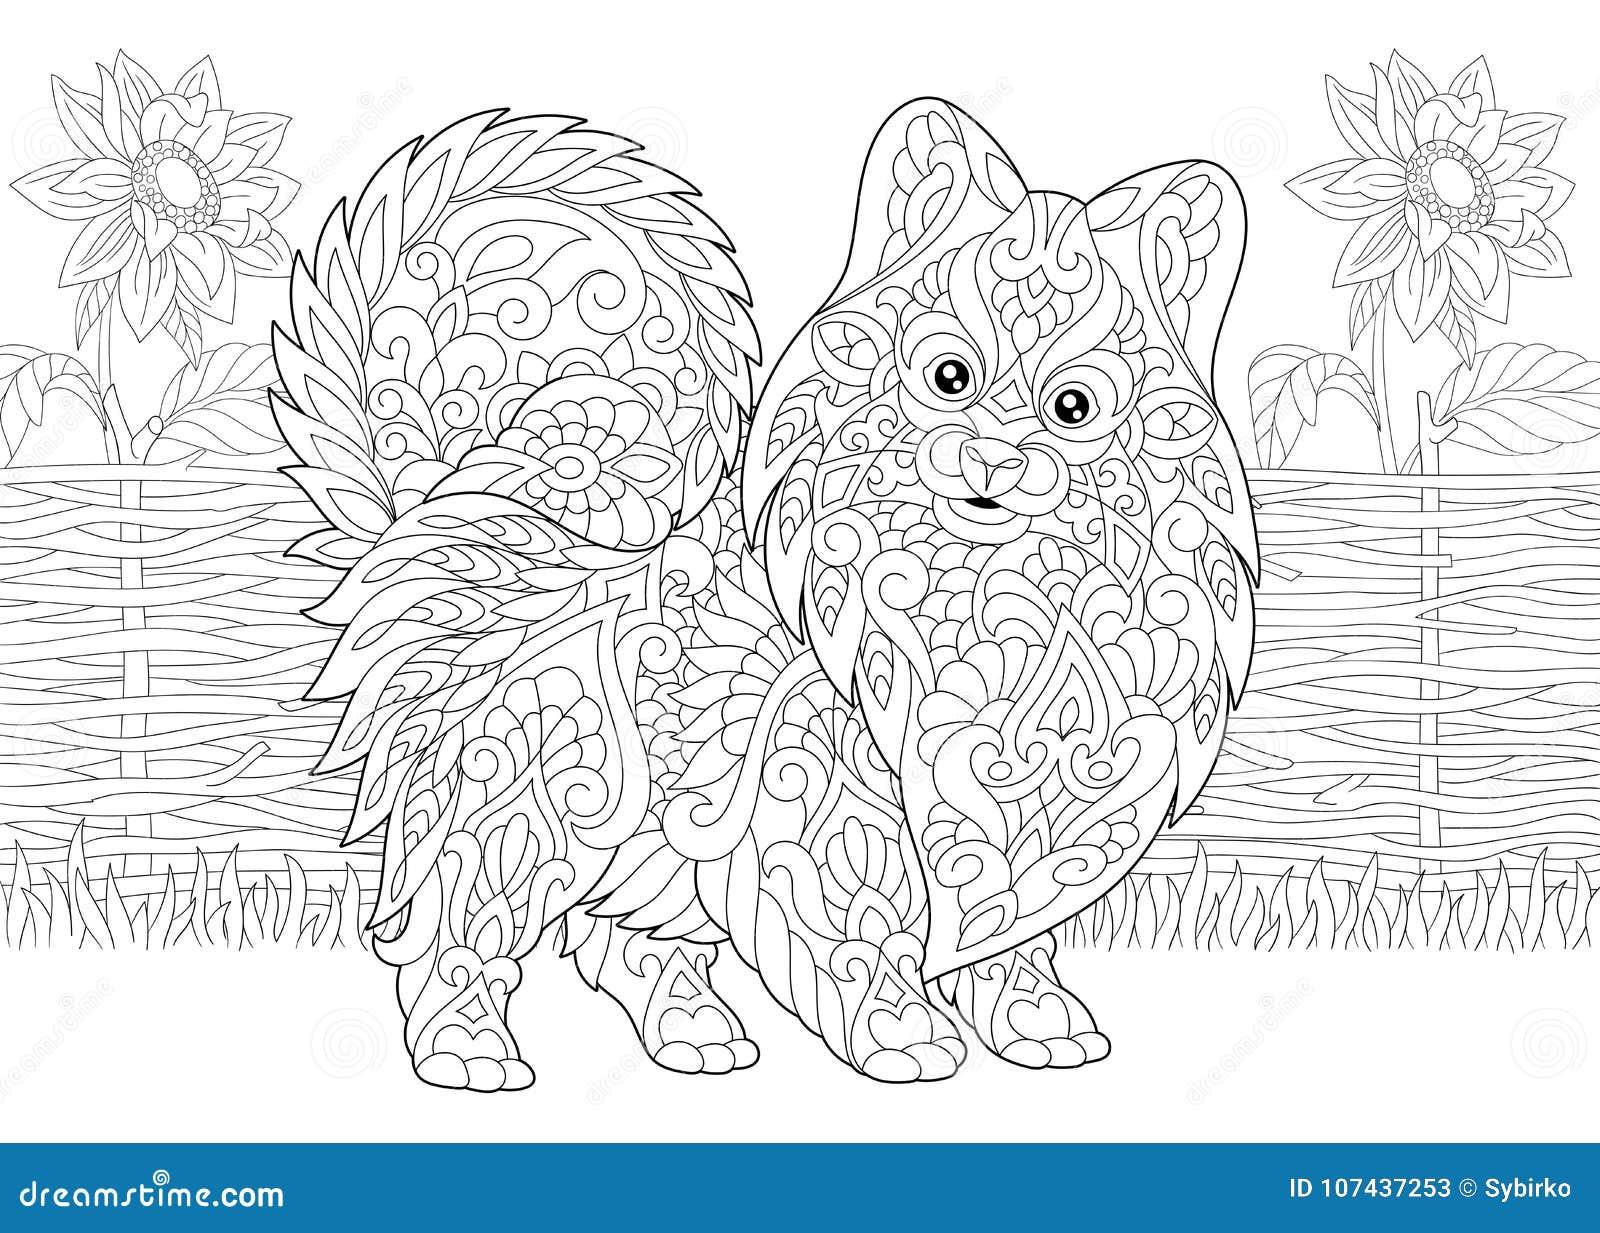 Zentangle Pomeranian Spitz And Sunflowers